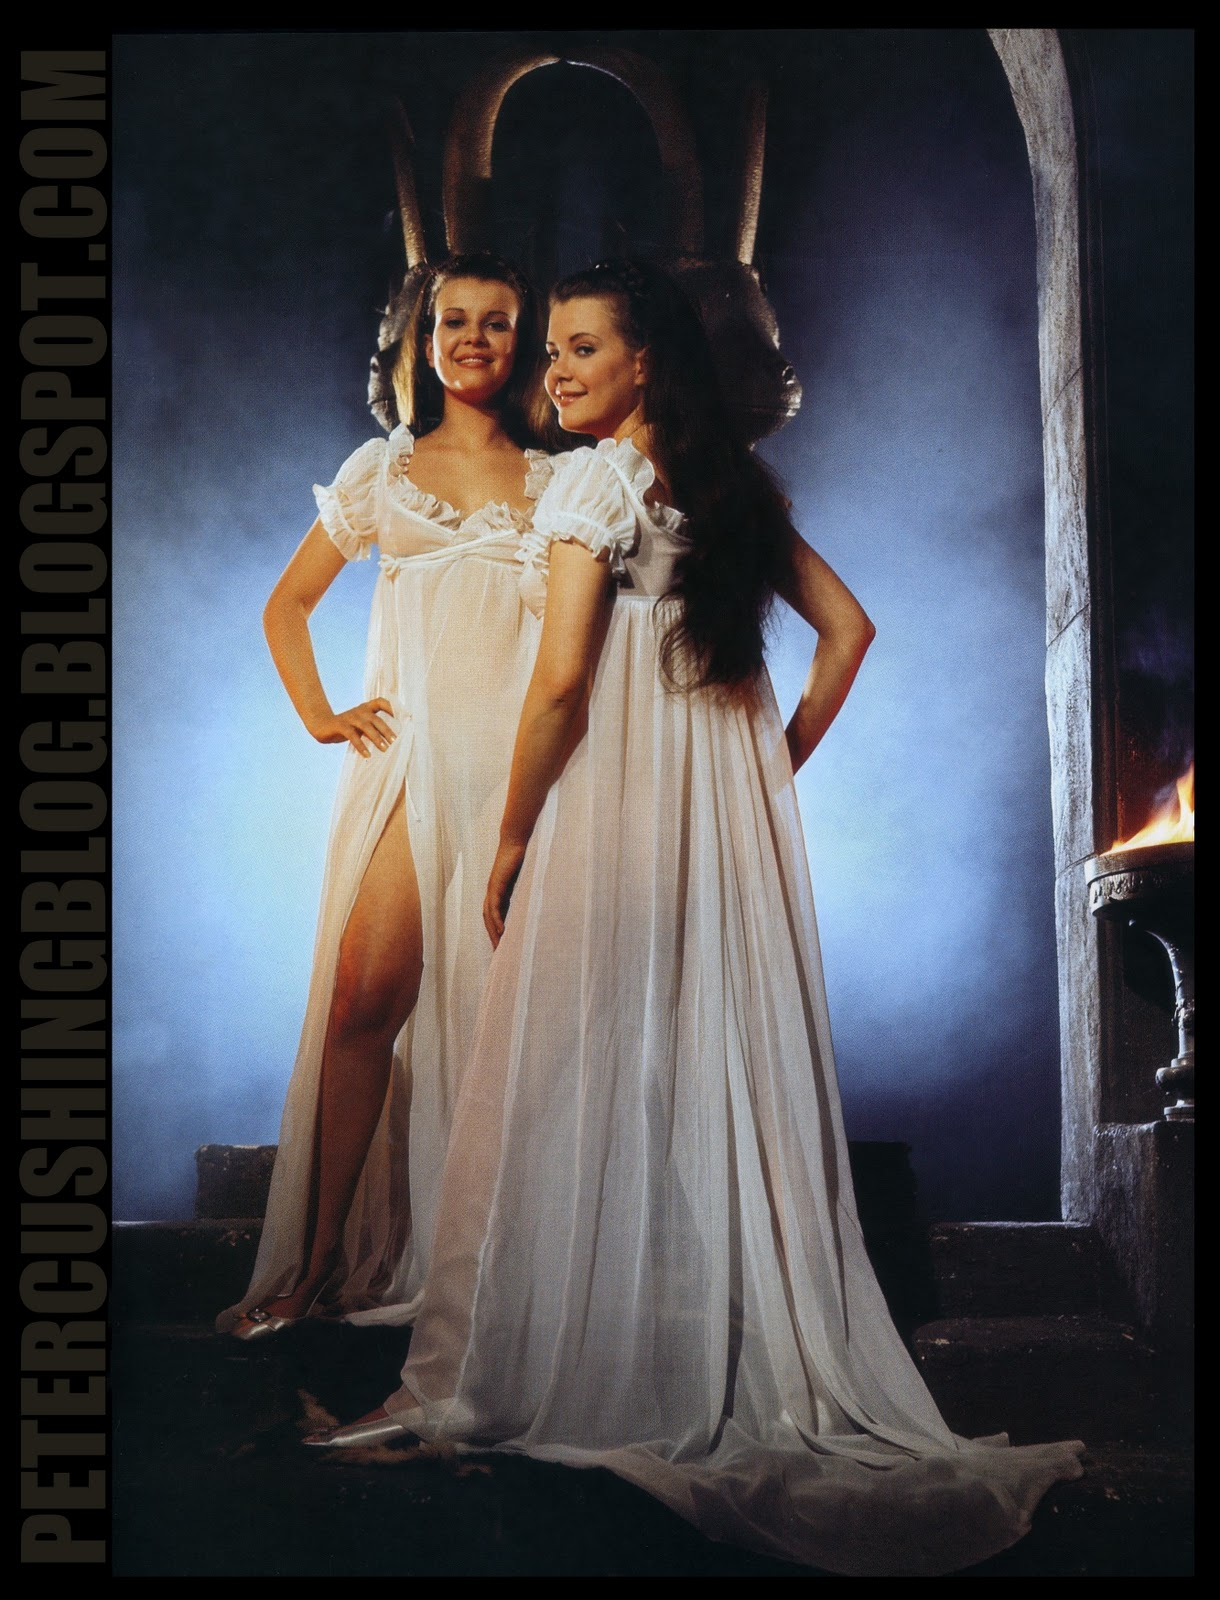 http://2.bp.blogspot.com/-R5VE3X5NVyQ/TwbsxIXQkrI/AAAAAAAADBw/cAurLjuAcHo/s1600/PETER+CUSHING+MARY+MADELAINE+COLLINSON+TWINS+OF+EVIL+HAMMER+FILMS+23.jpg